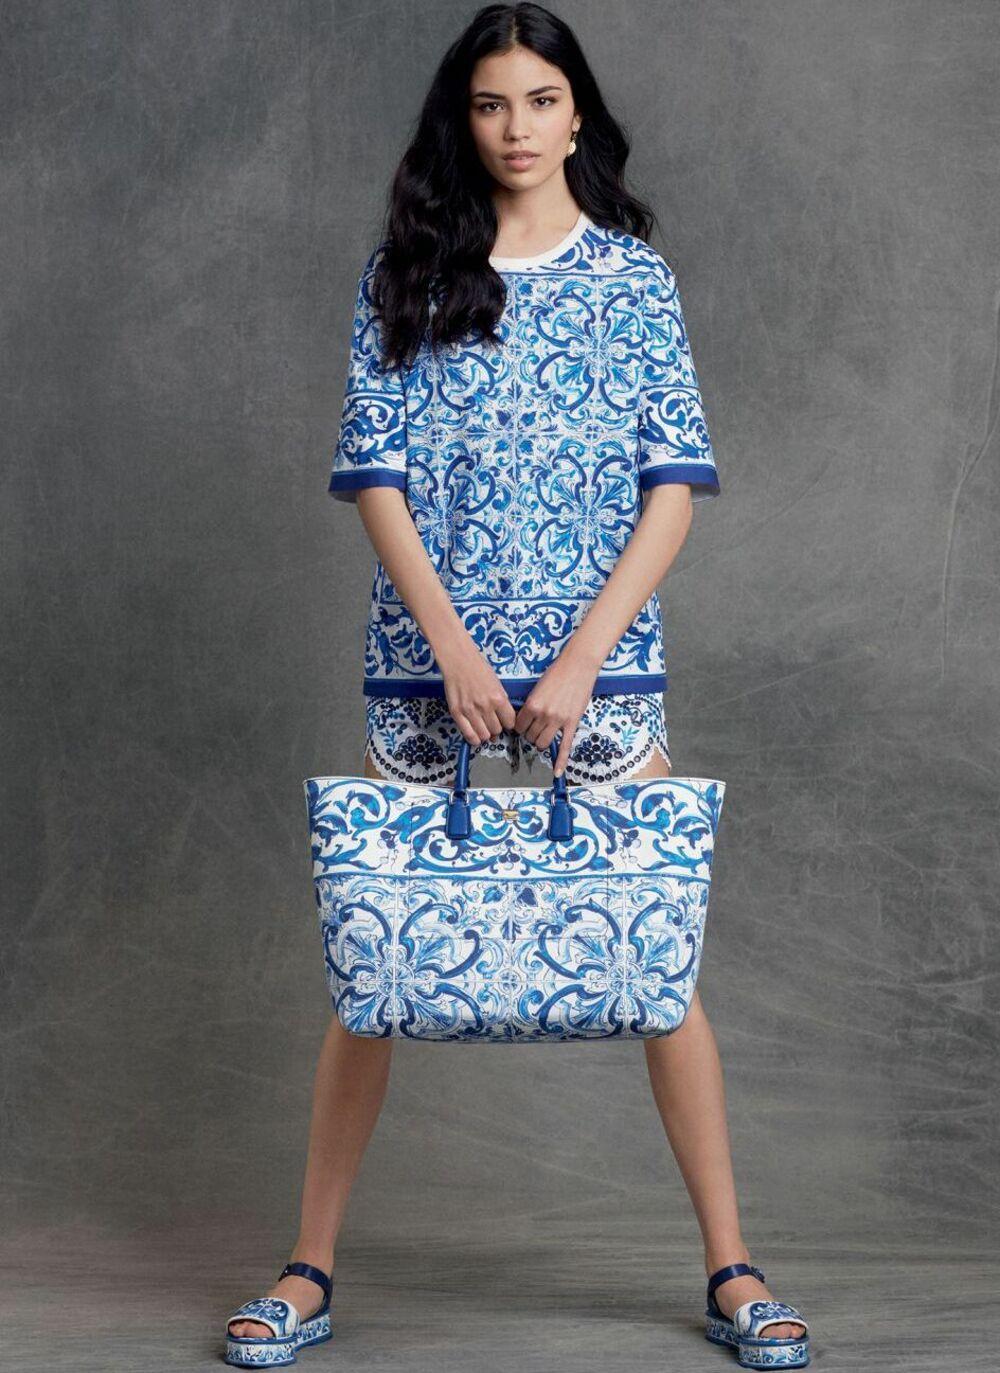 Платье, сумочка и обувь из маталассе